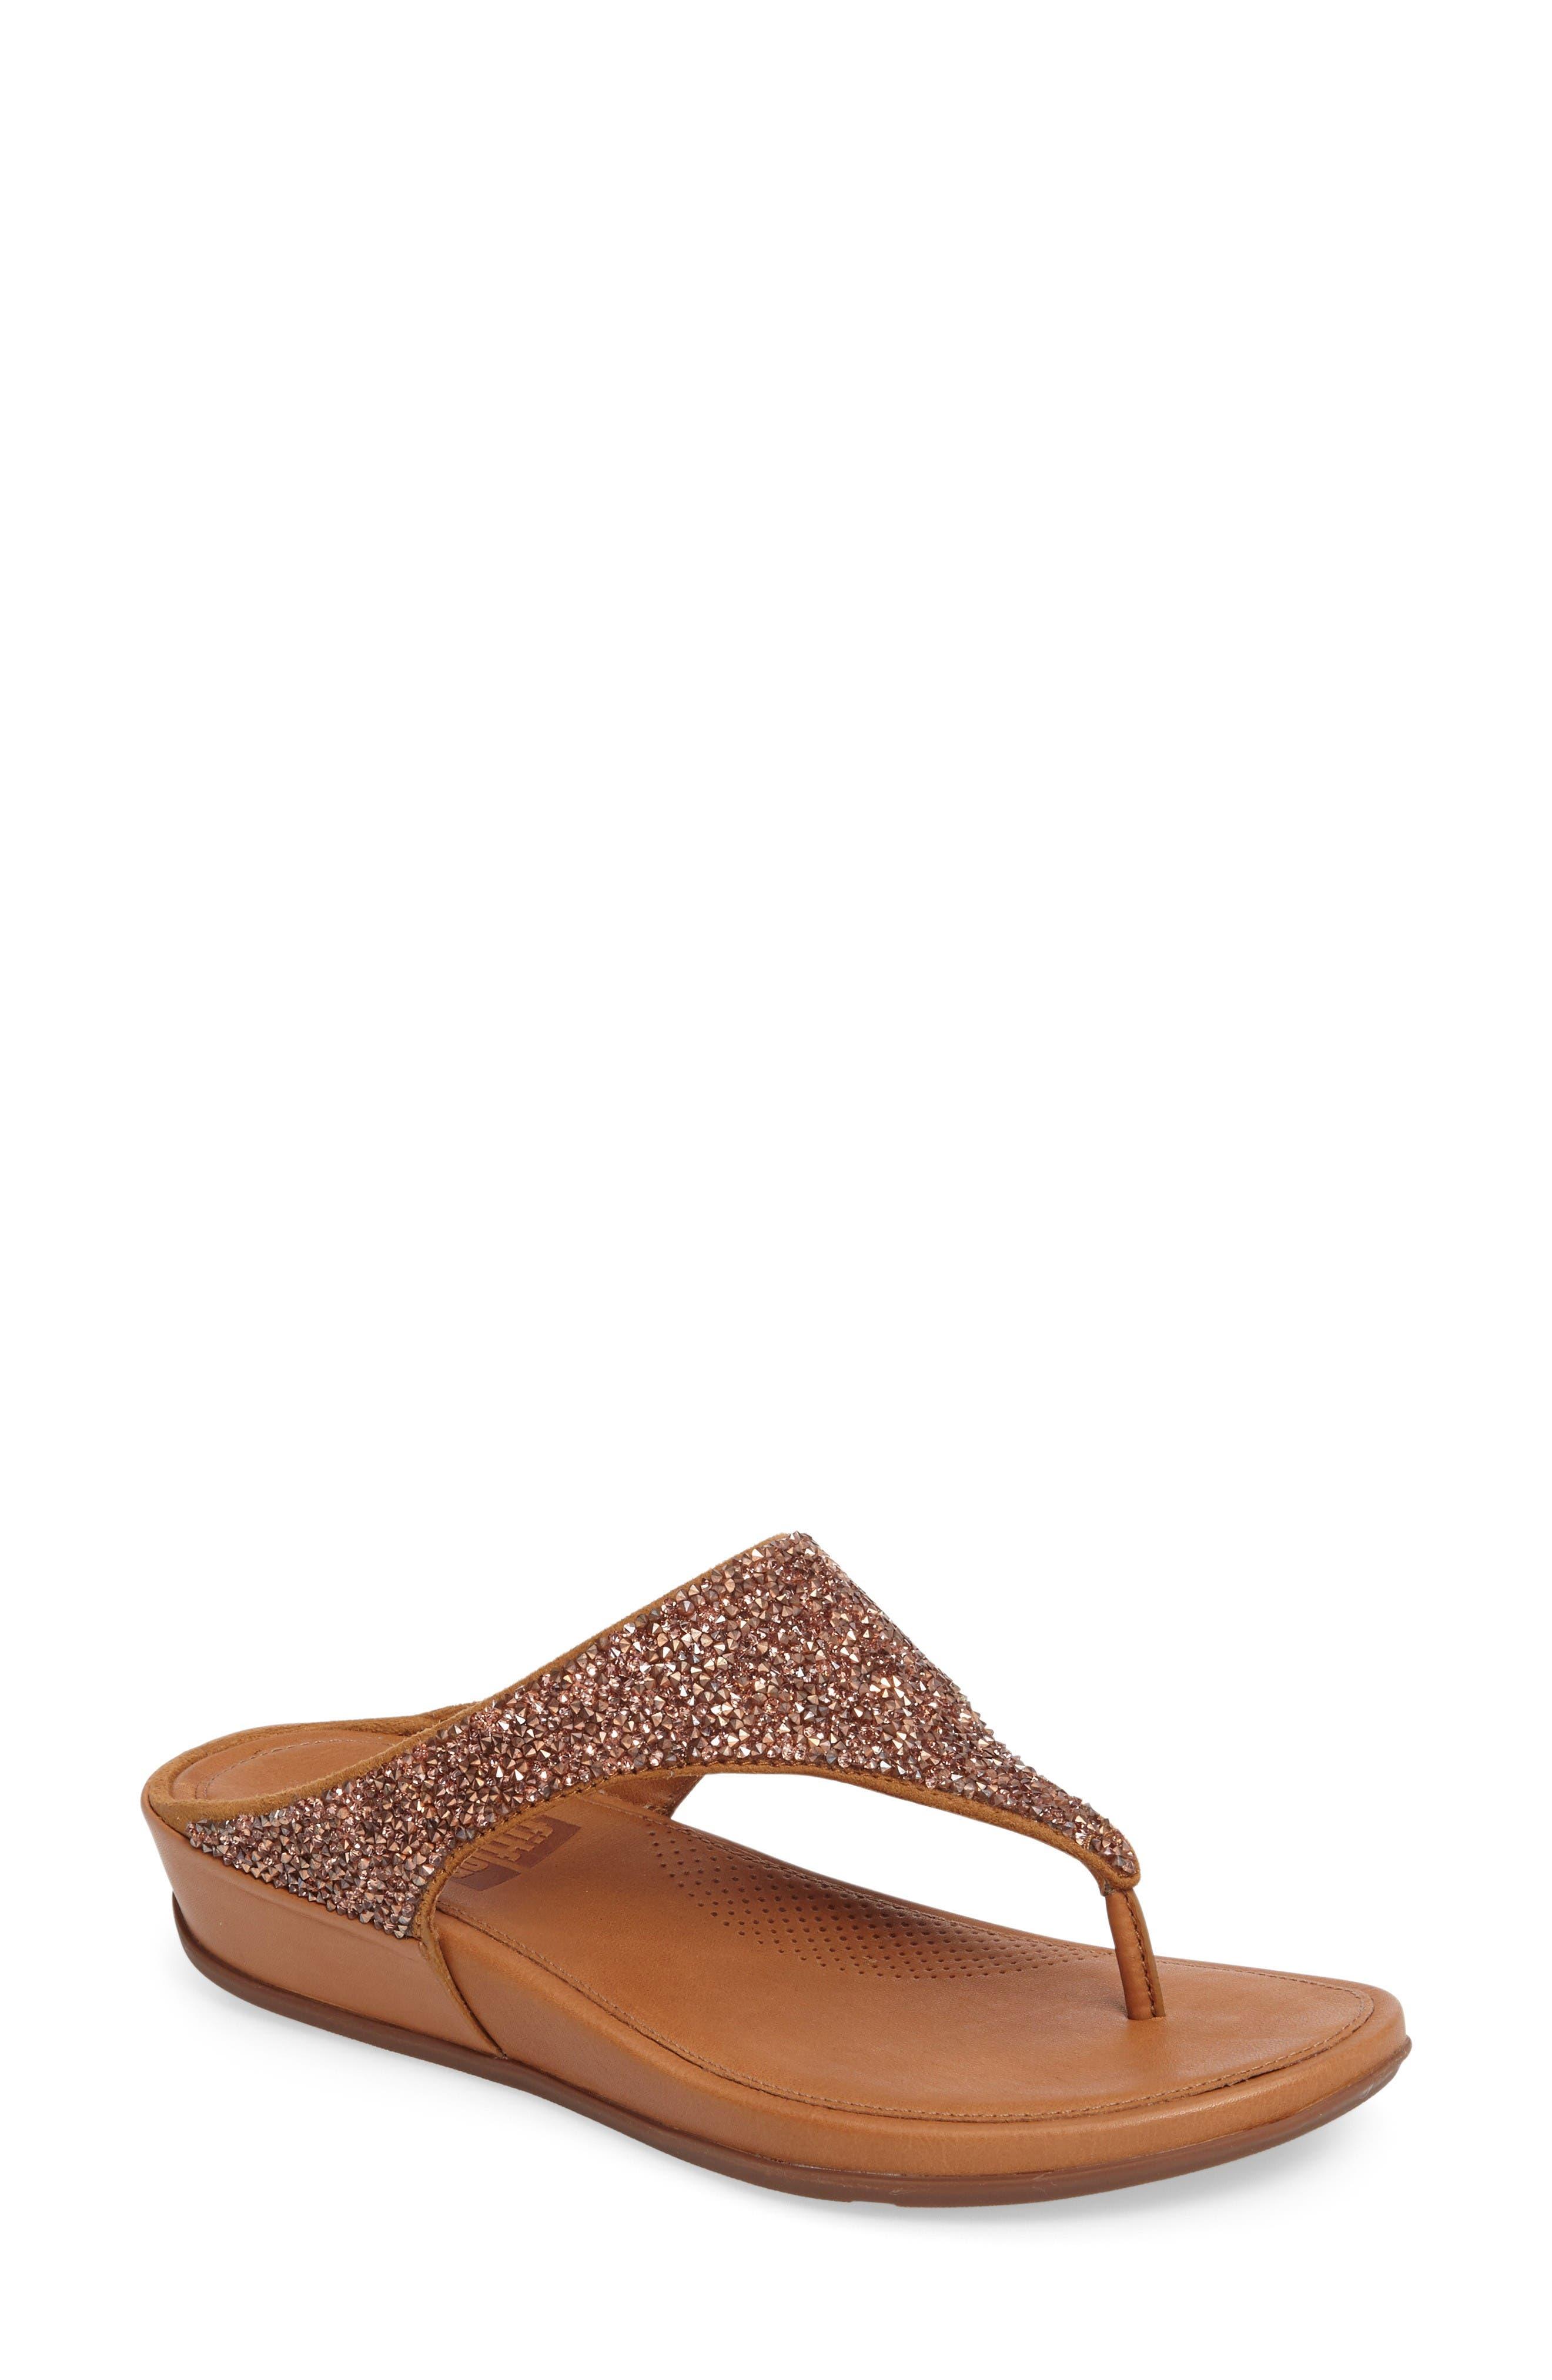 FITFLOP 'Banda Roxy Supercomff™' Sandal